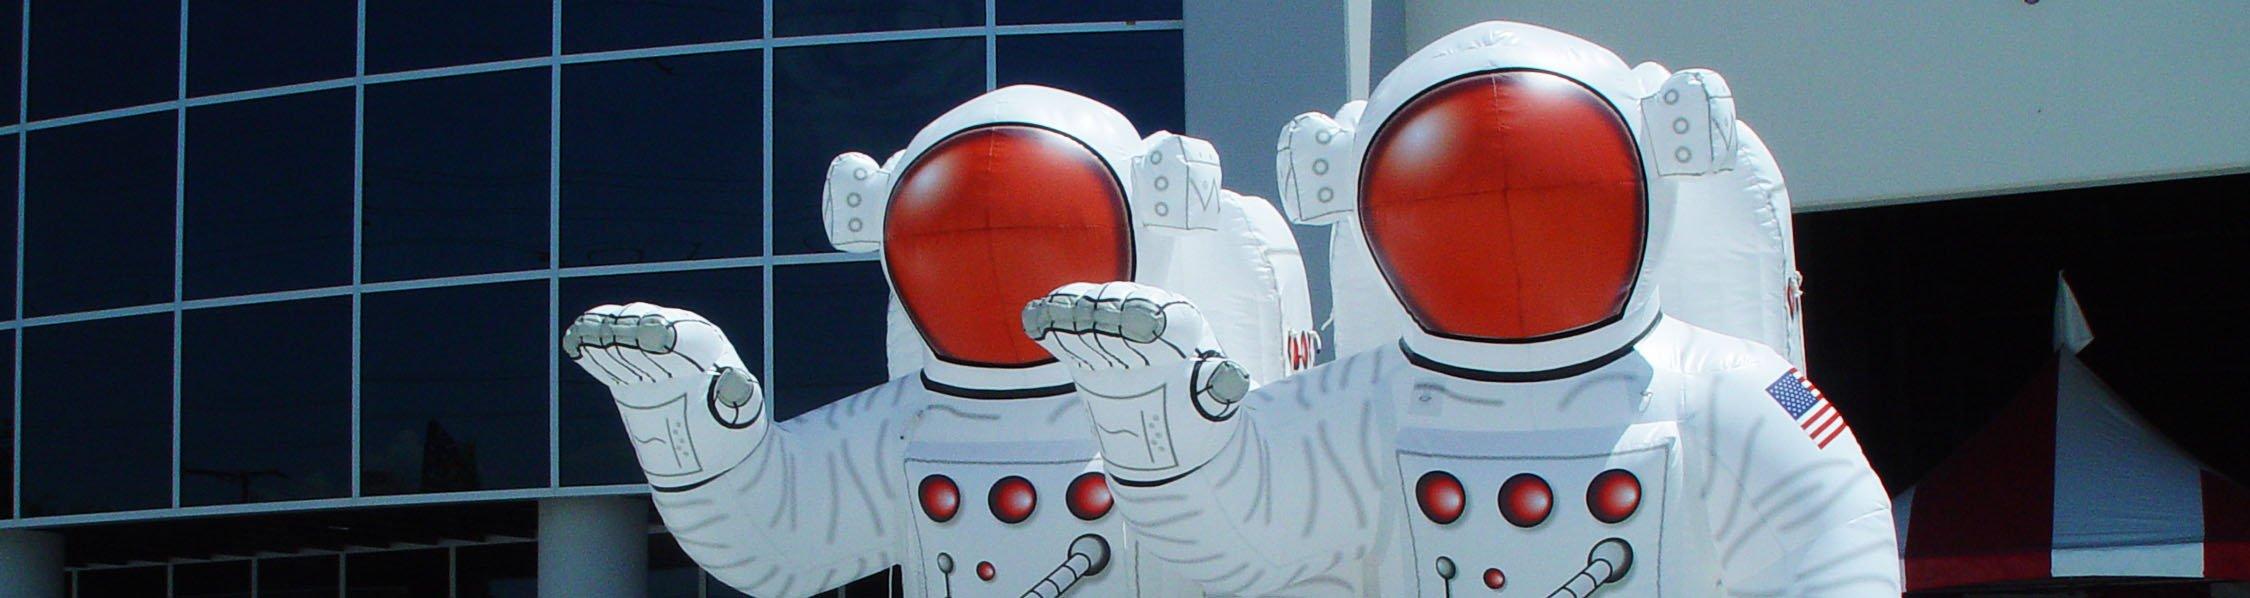 inflatable-astronaut-header.jpg